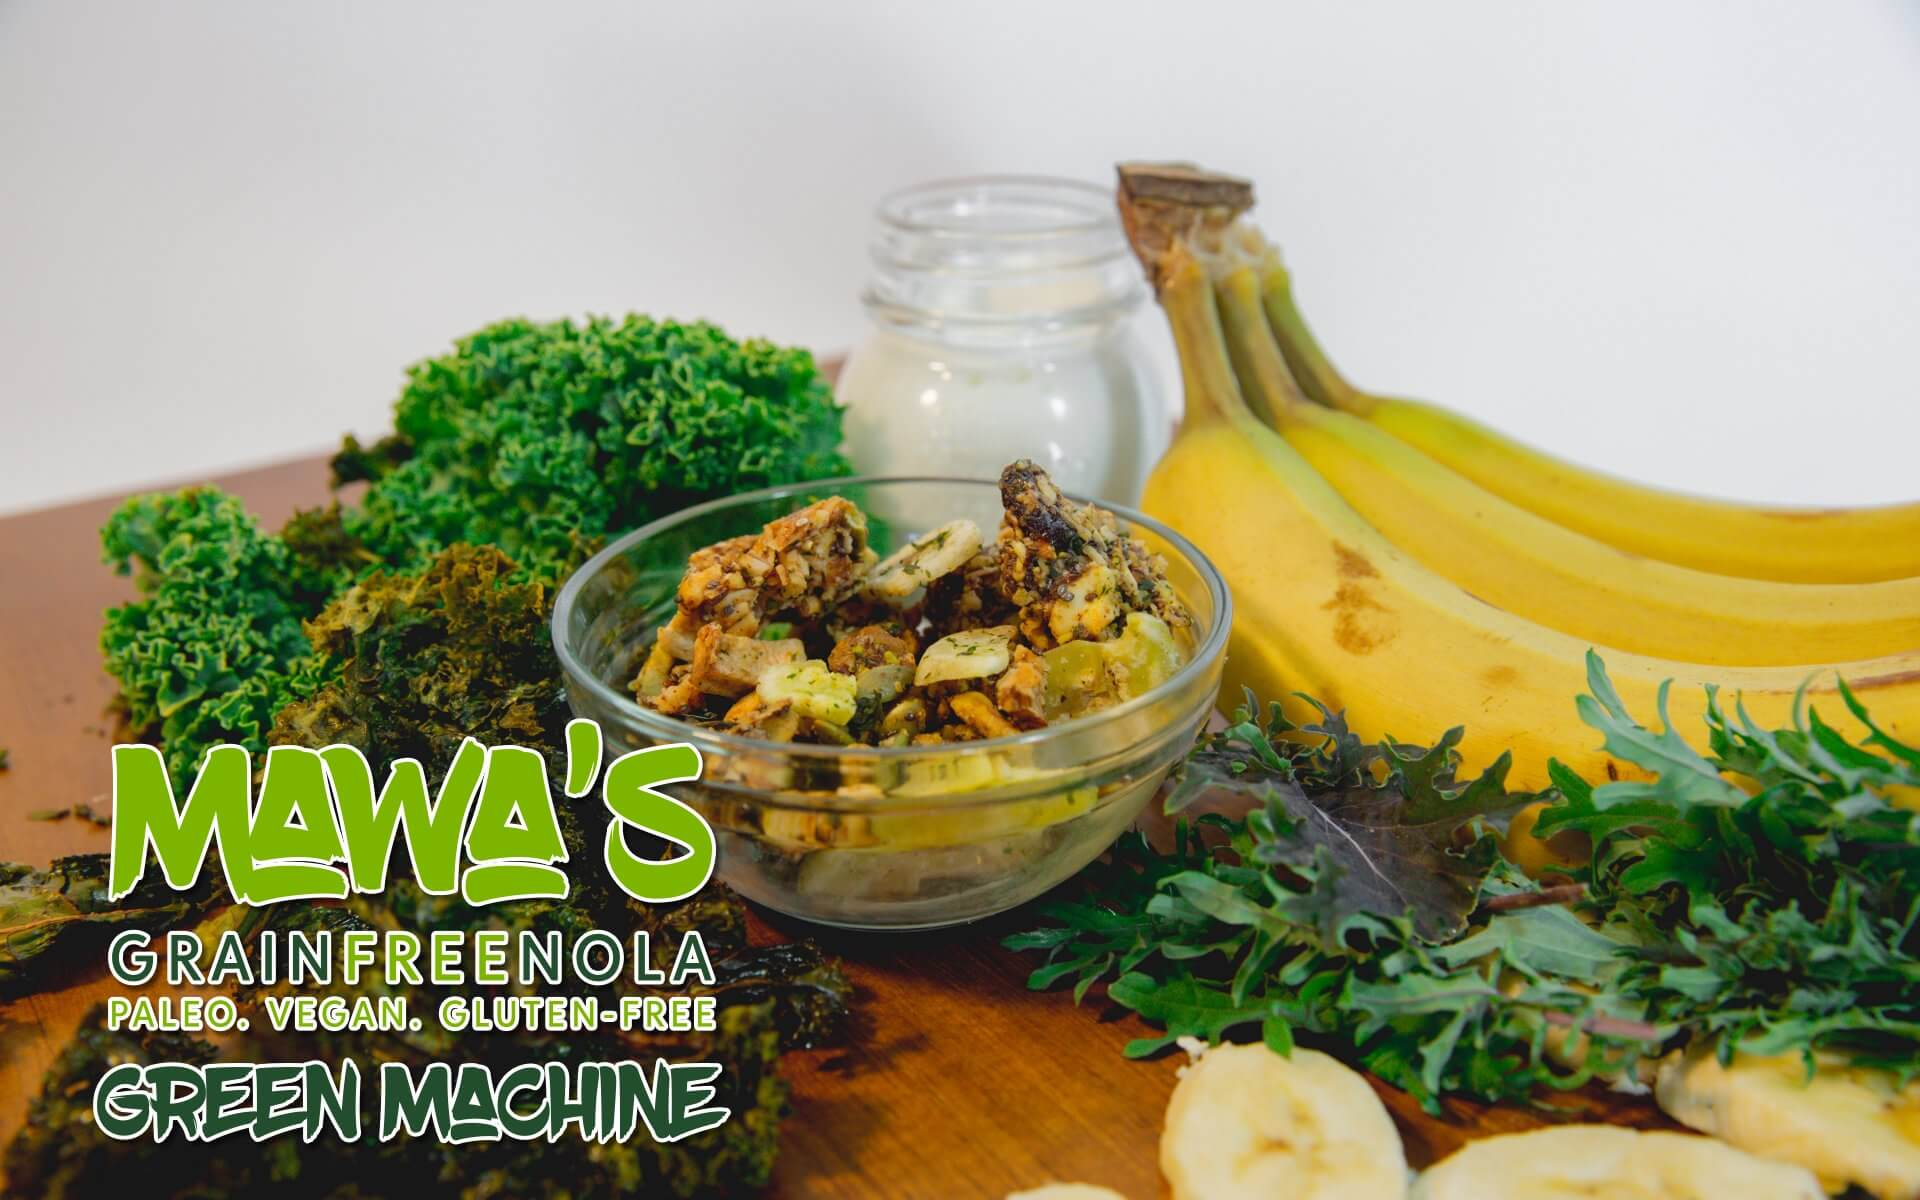 Mawa's GrainFreeNola - Green Machine Paleo, Vegan, Gluten-Free Granola